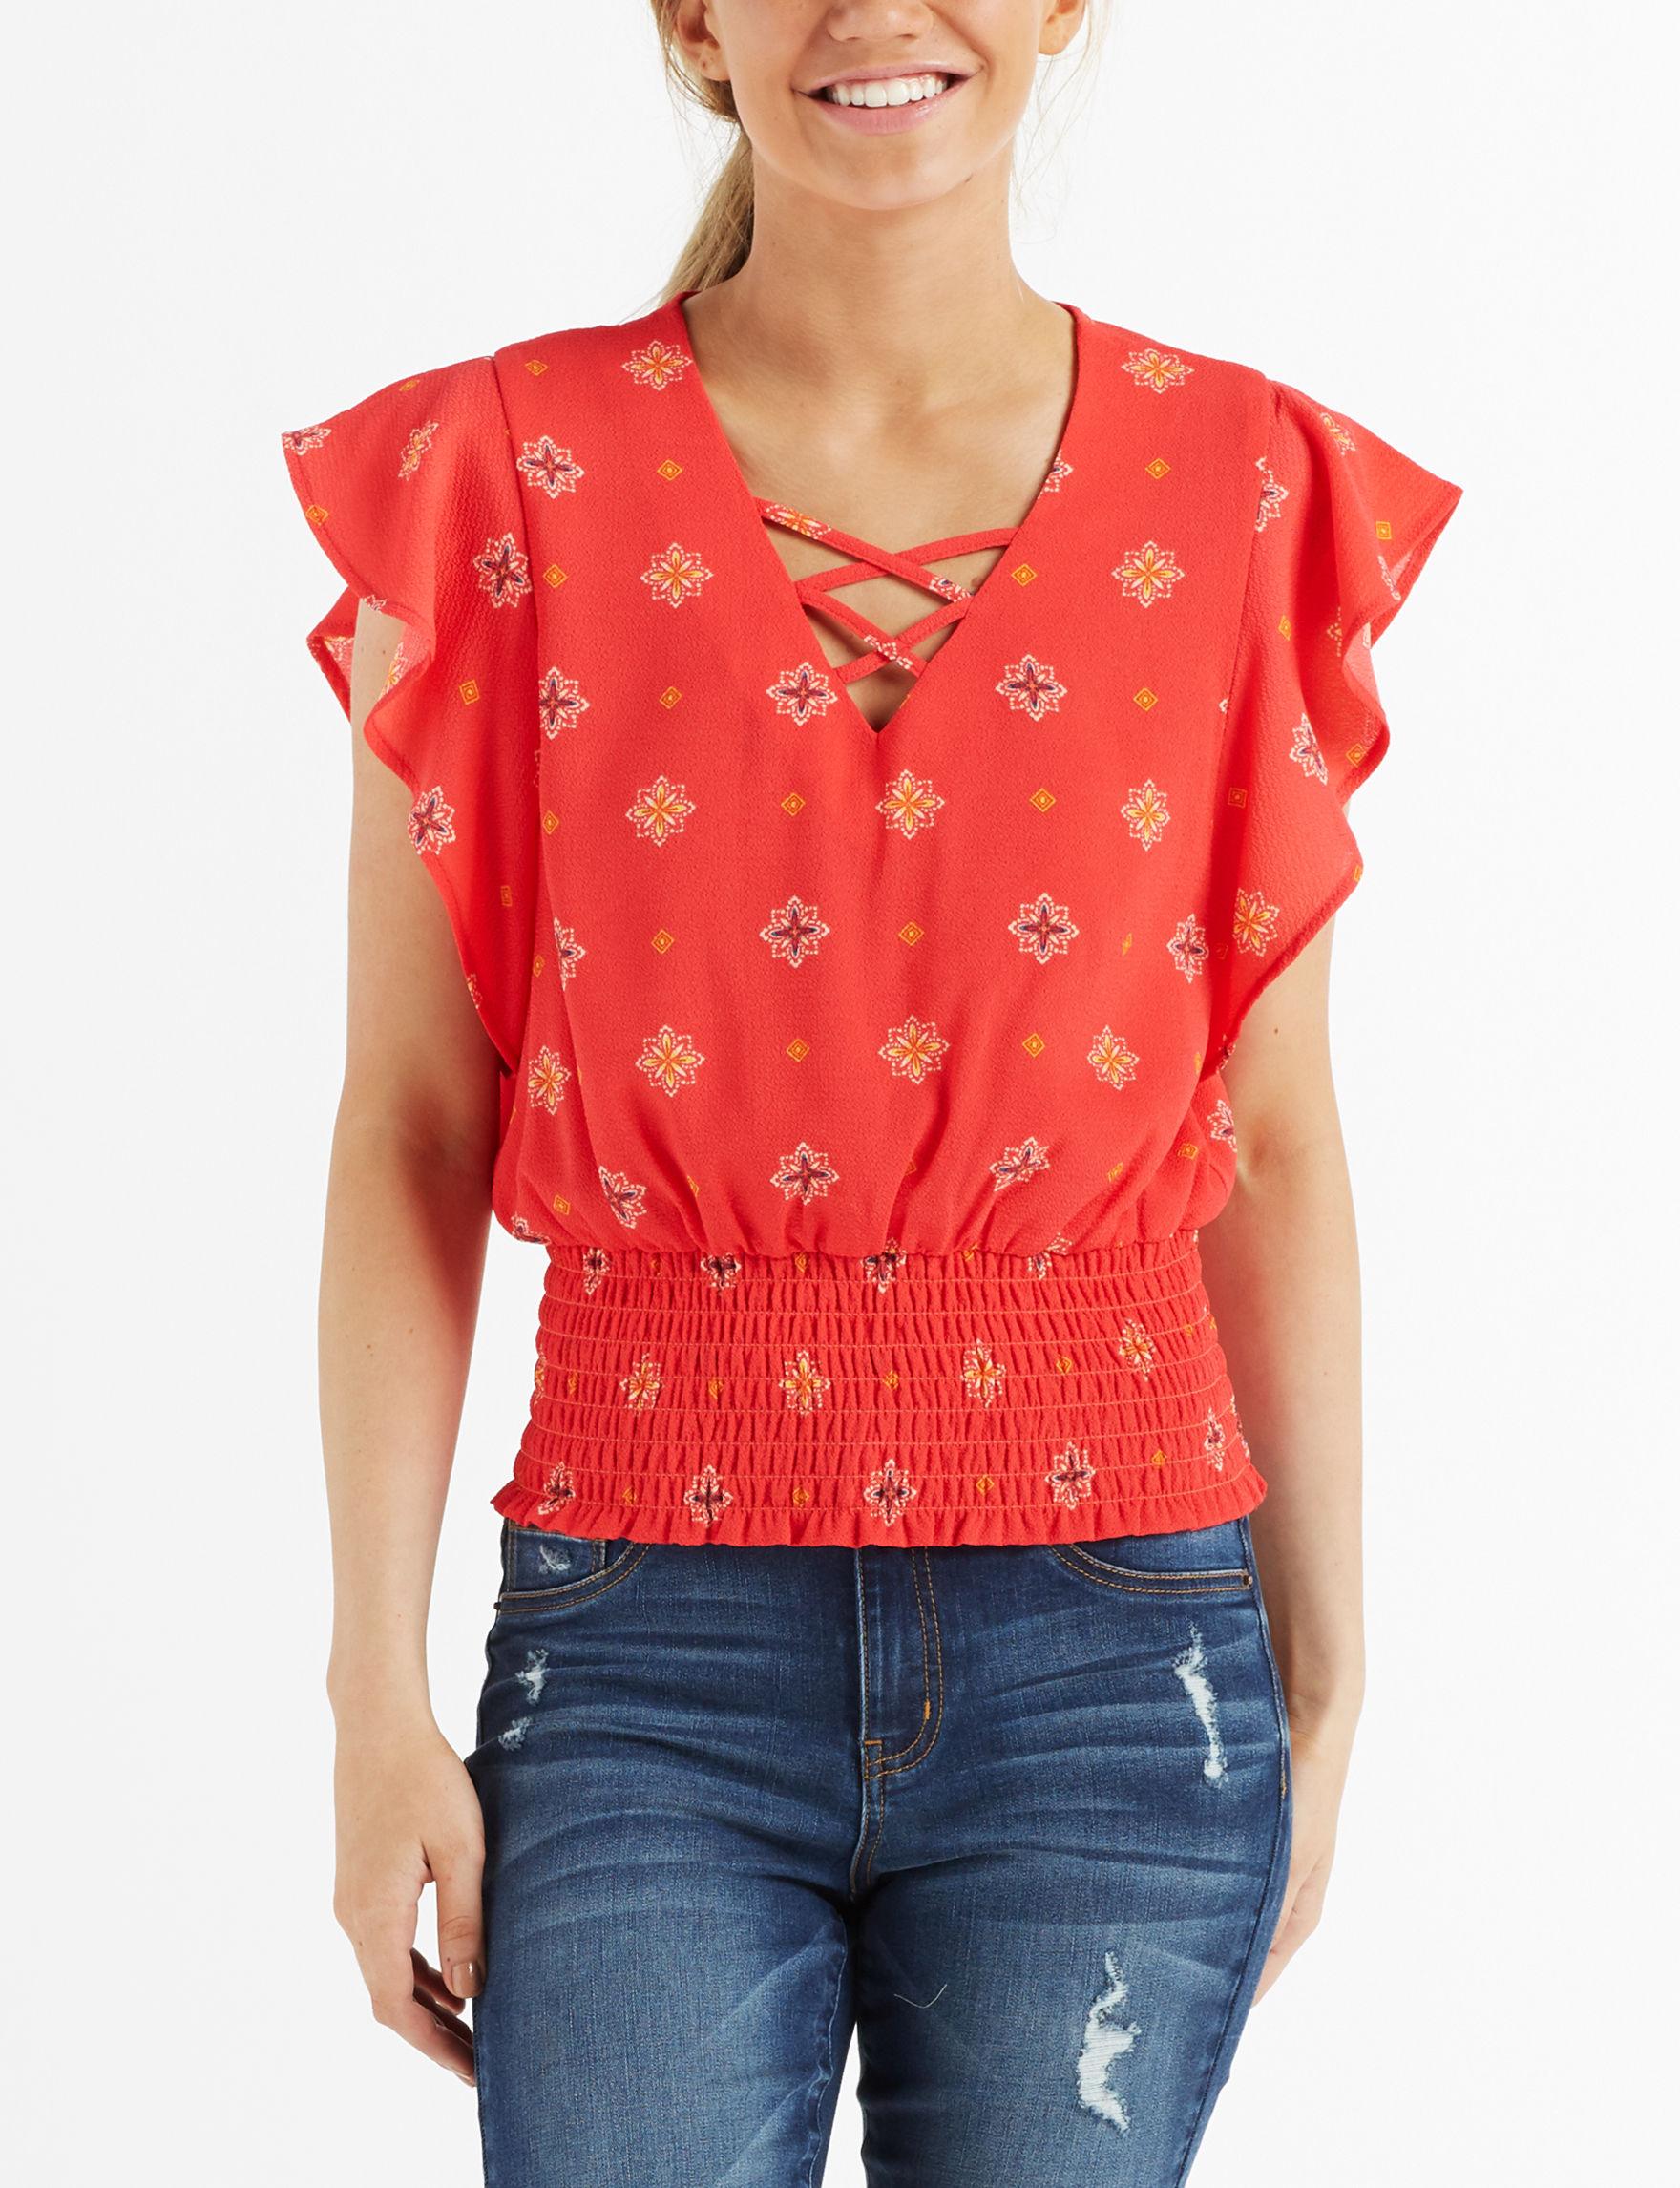 Wishful Park Coral Multi Shirts & Blouses